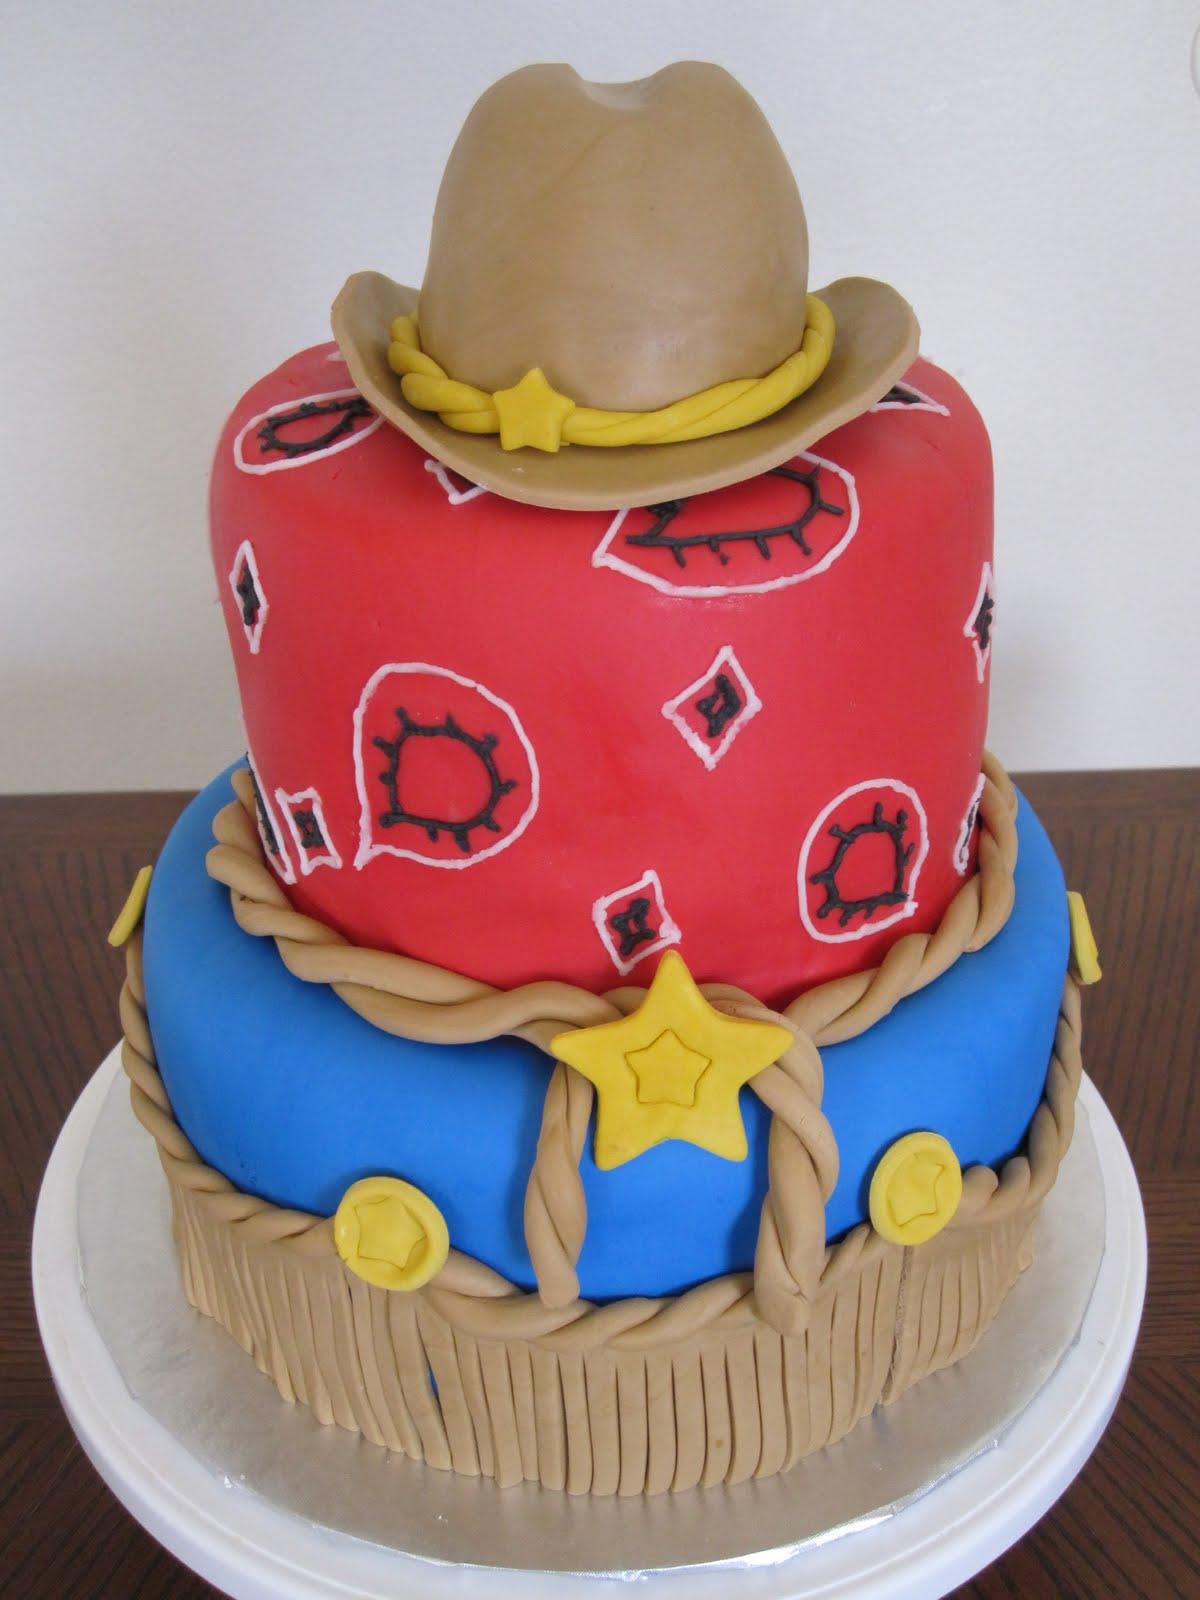 http://3.bp.blogspot.com/-uf0RL_LuVkM/TWrHkdAhPhI/AAAAAAAABu8/oXtfNX8DMt4/s1600/Cowgirl+Cake.JPG